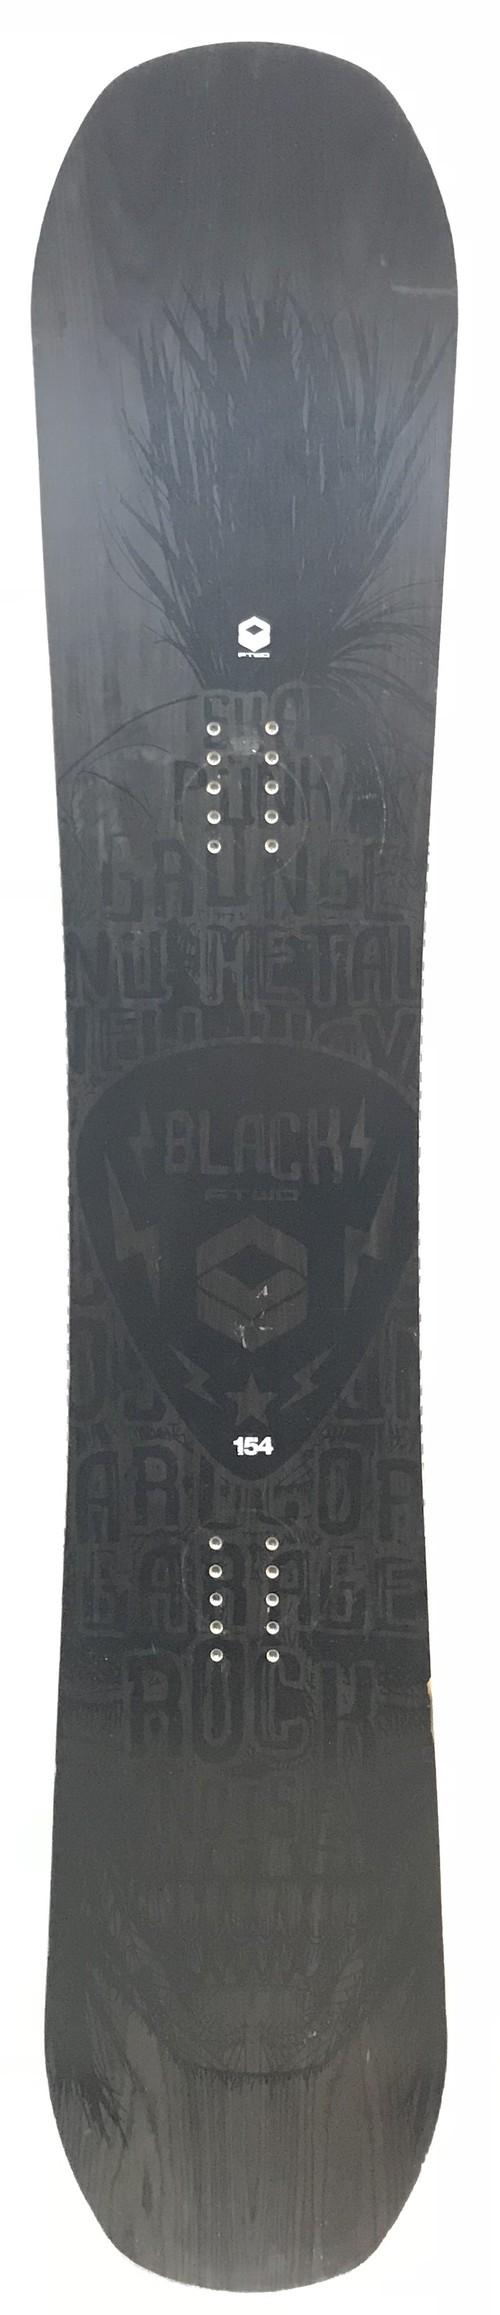 【FTWO-BLACKDECK LTD 147】1ヶ月レンタルプラン